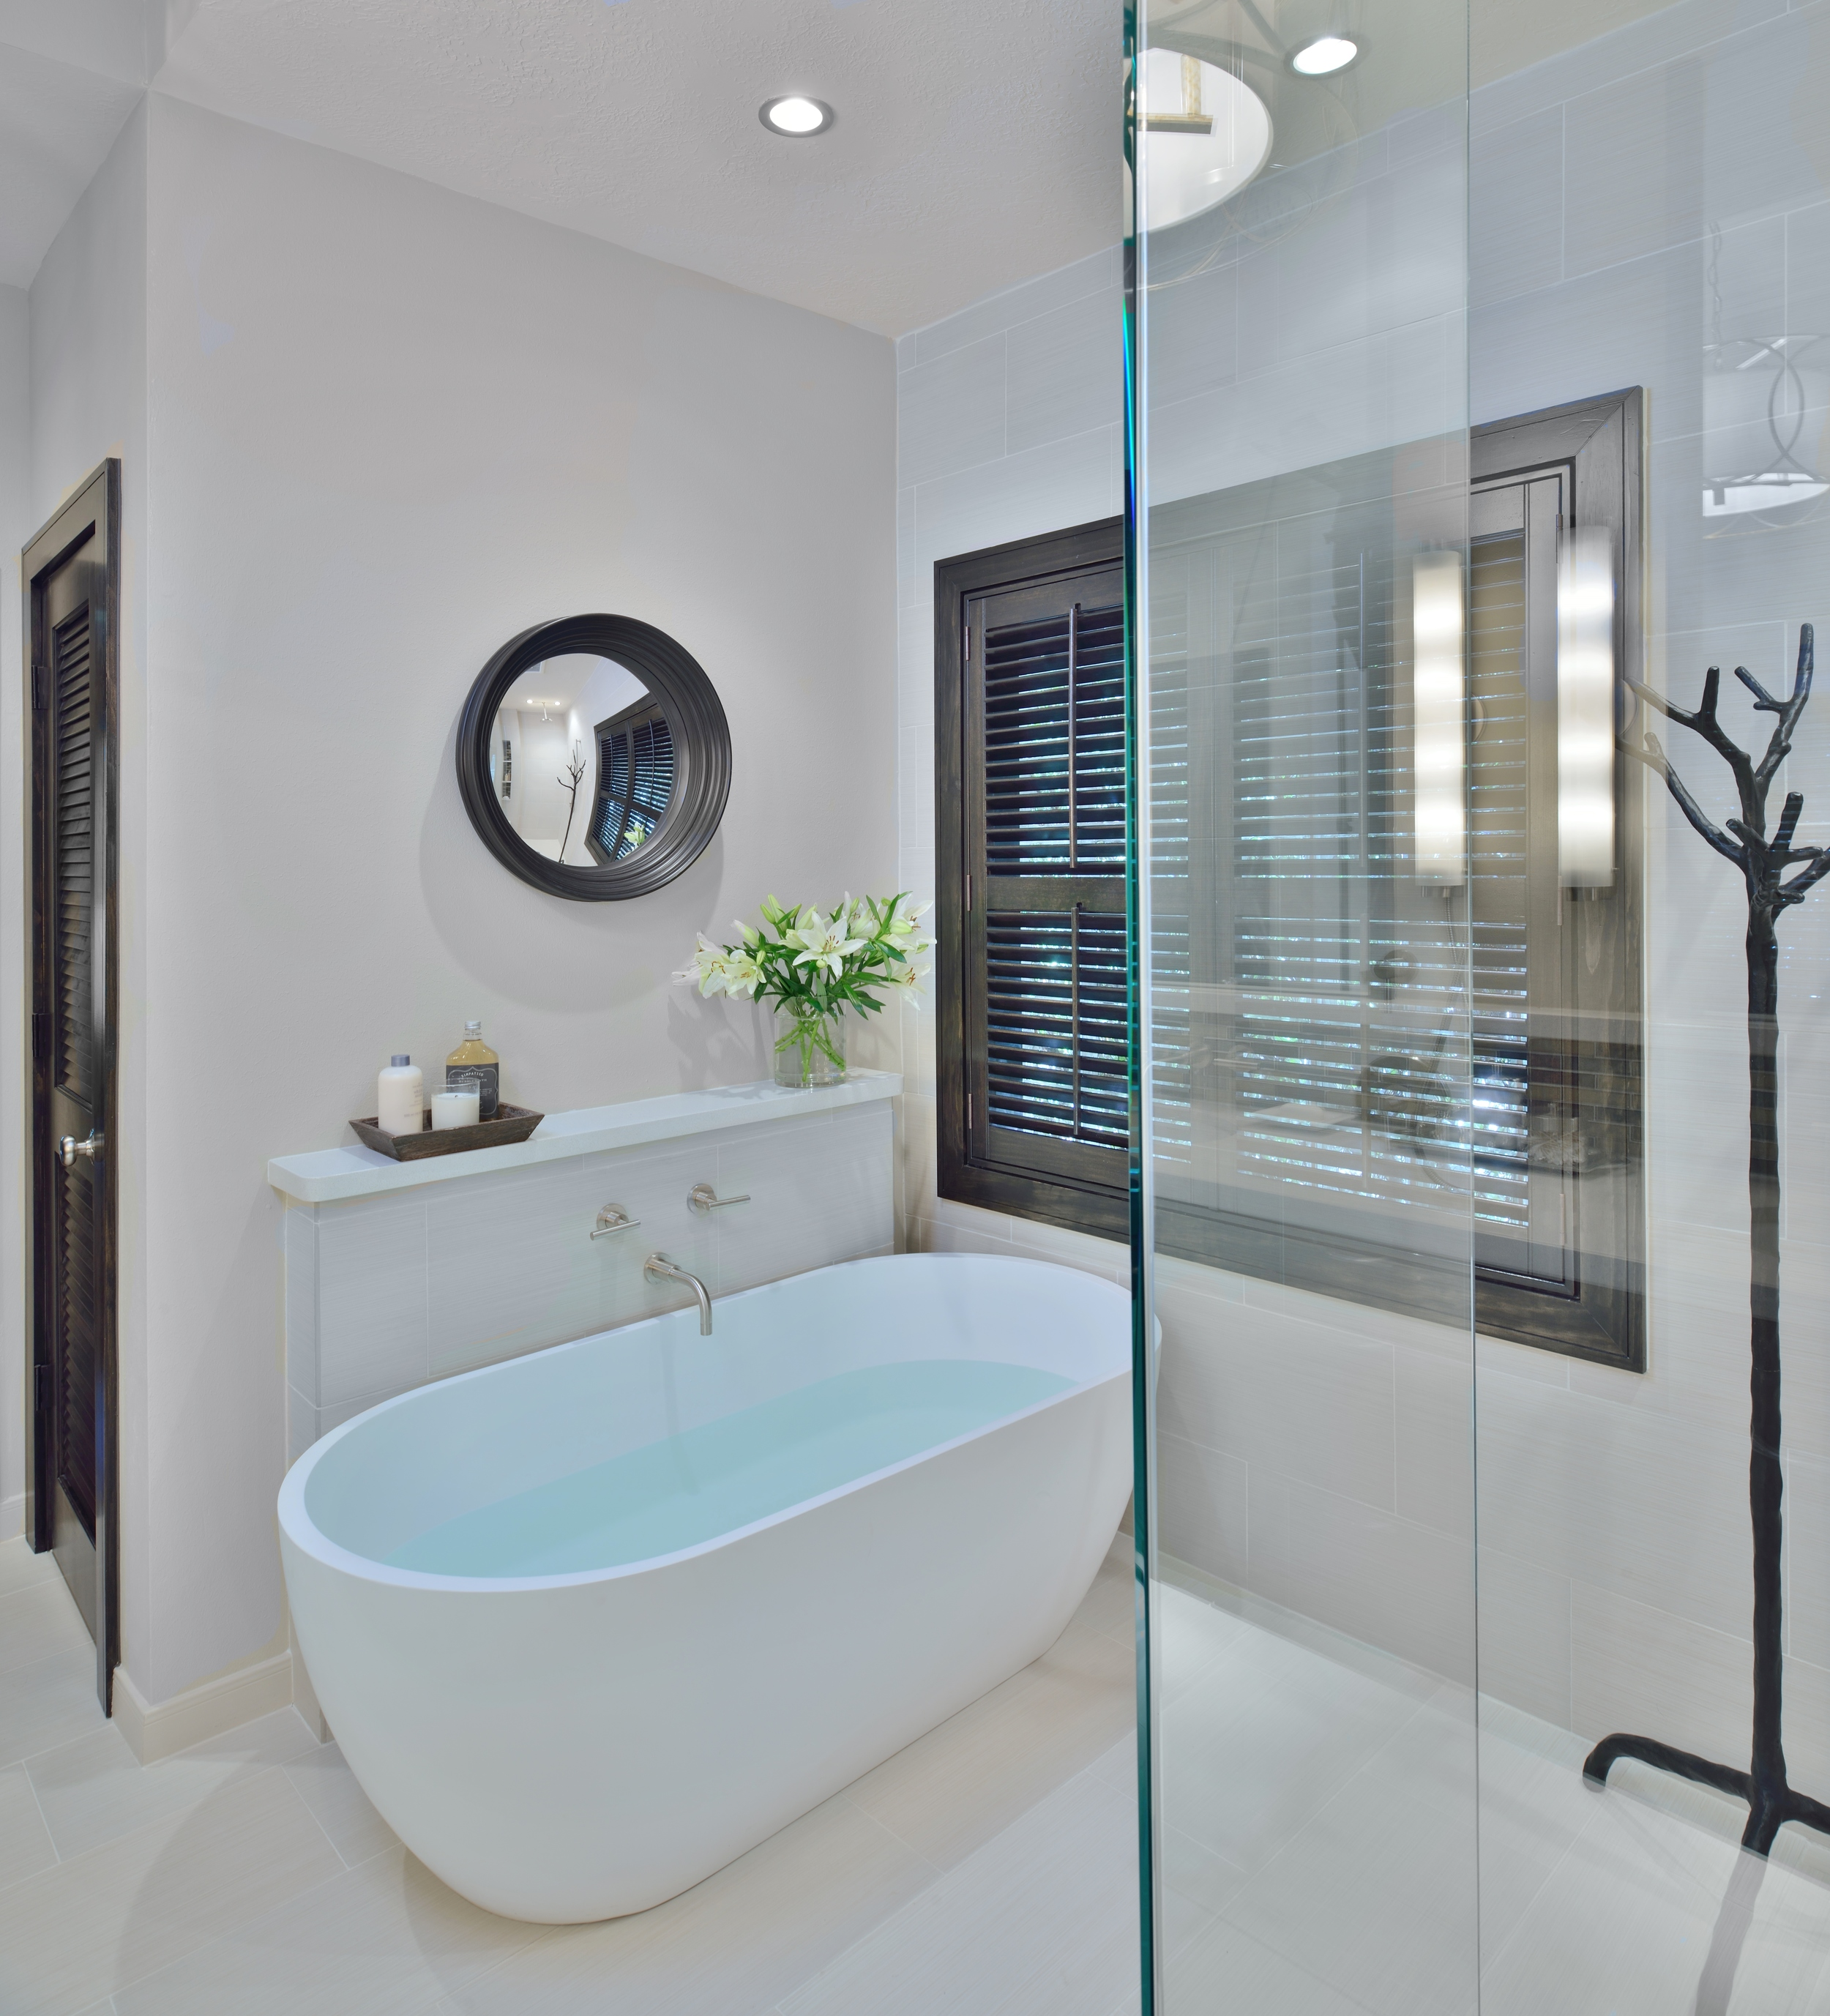 A Builder Grade Bathroom Is Made Modern, Designer: Carla Aston